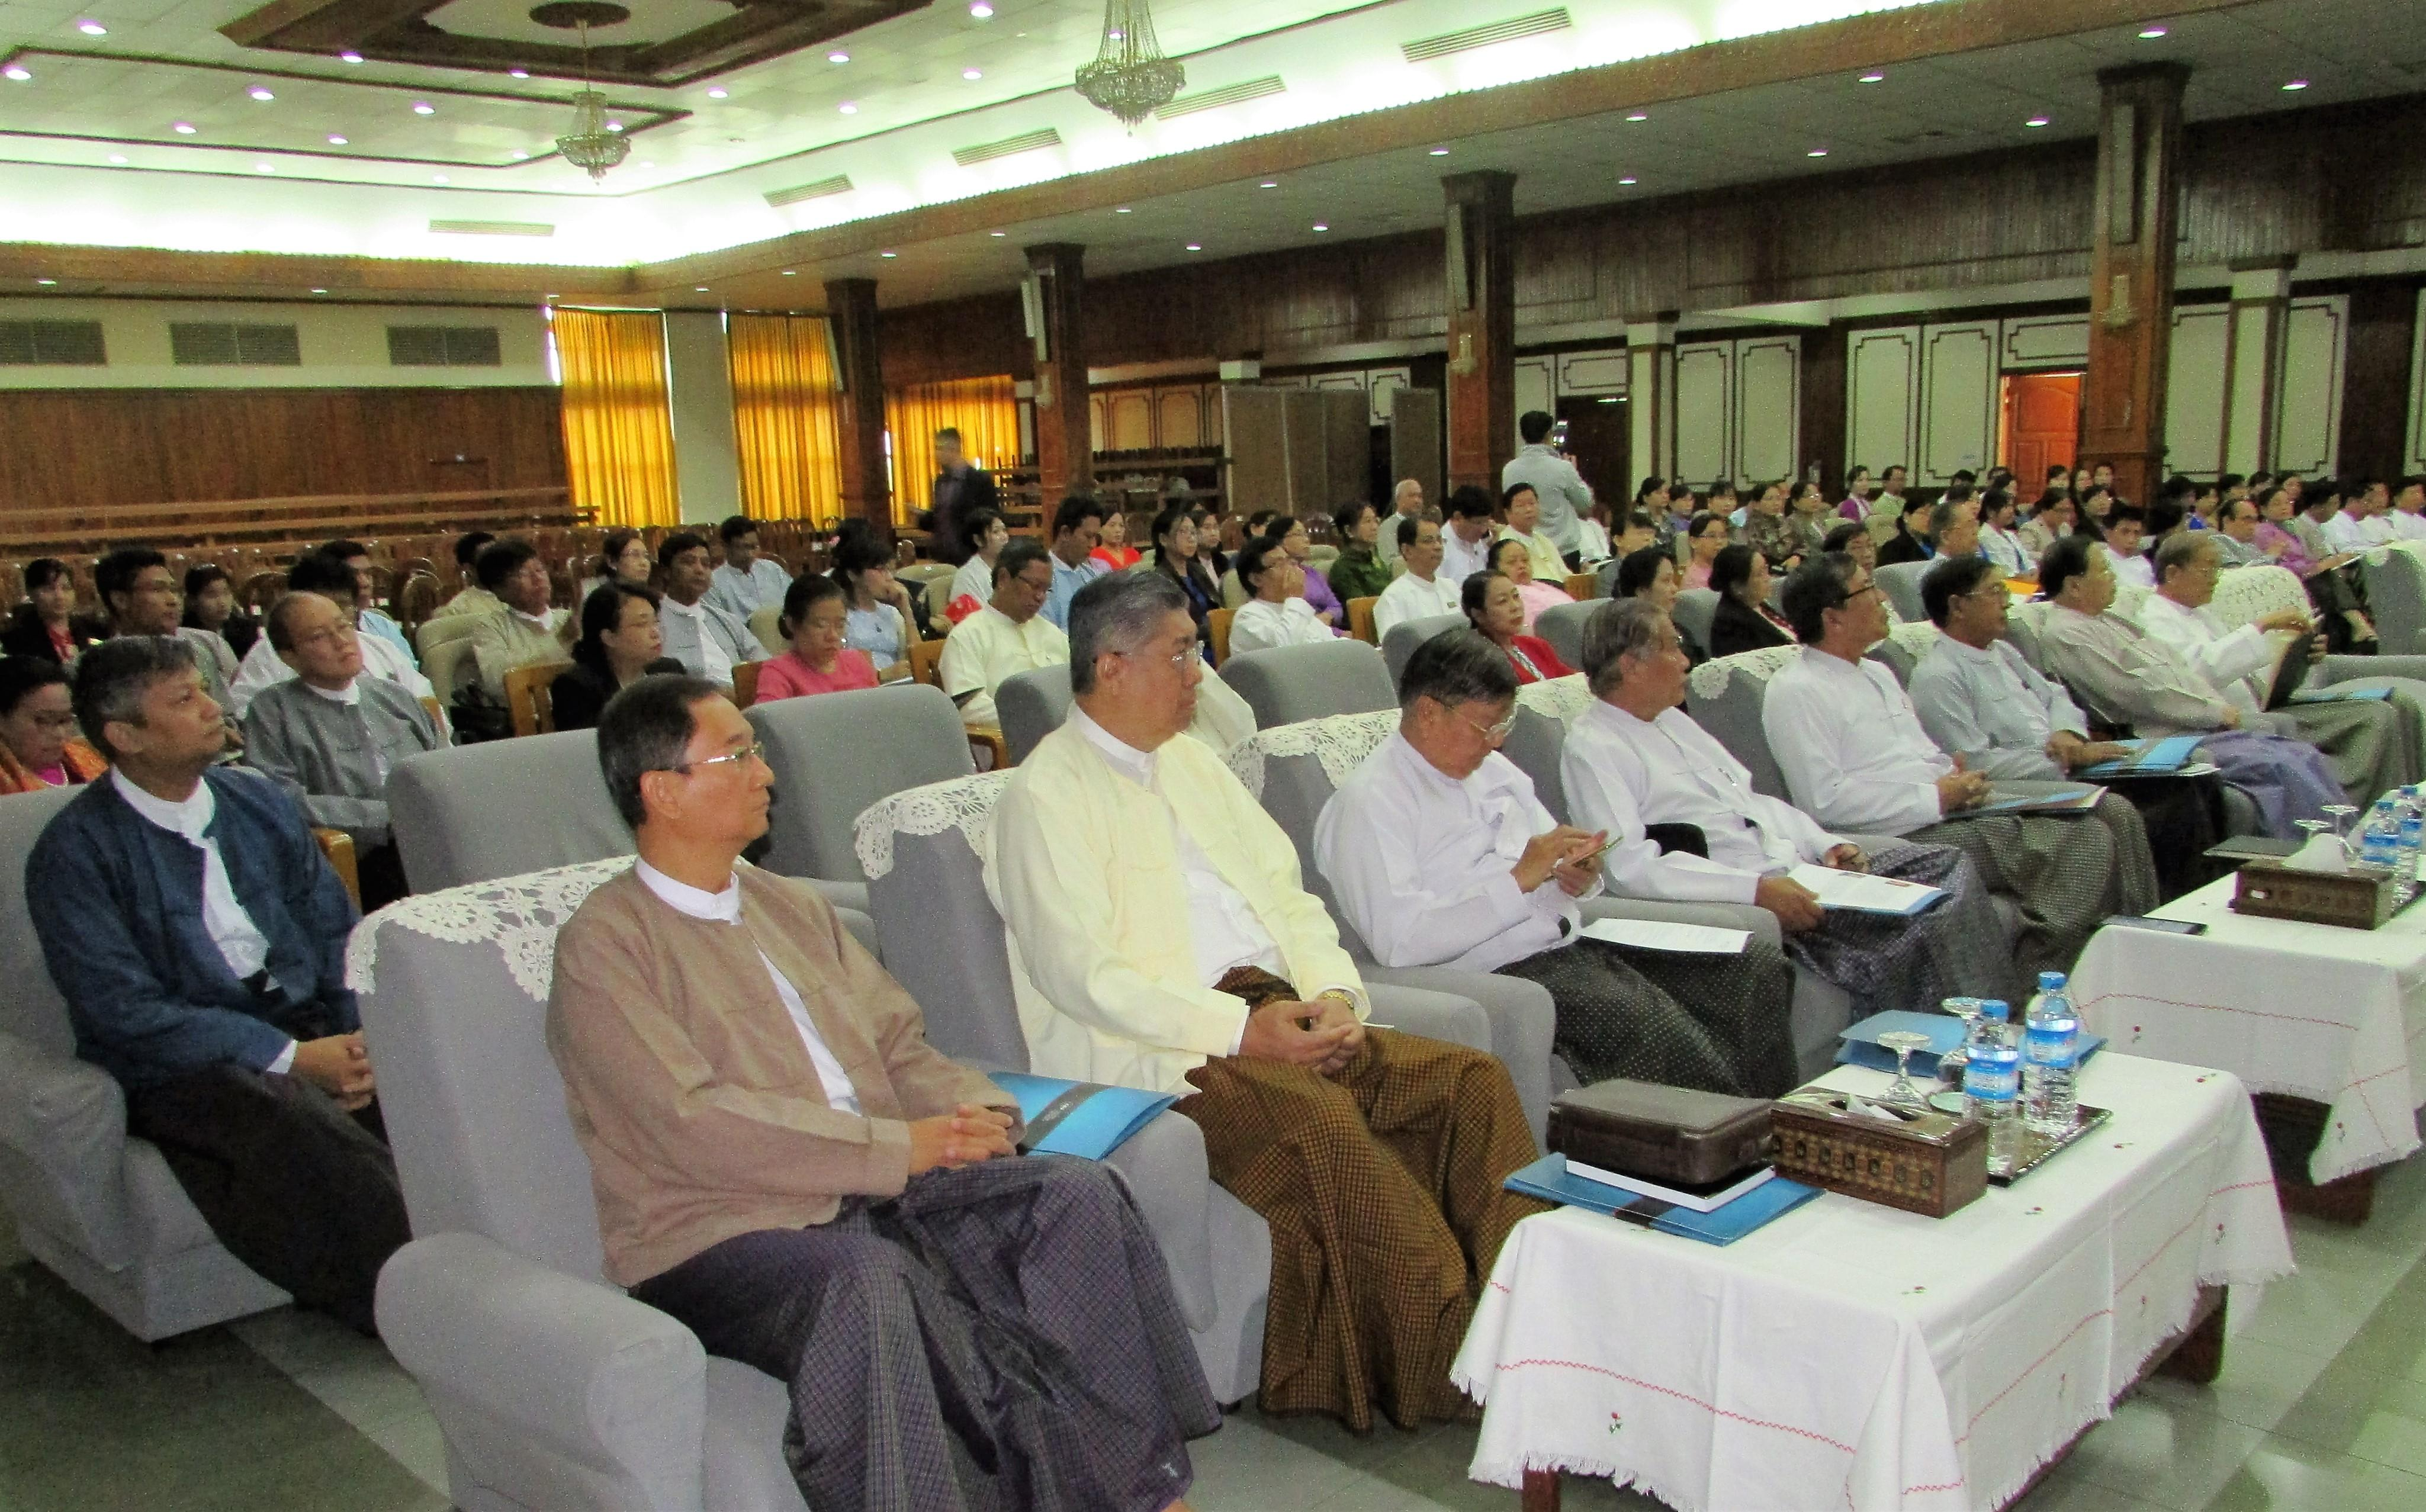 Participants in workshop on quality assurance organized by CEU, Diamond Jubilee Hall, Yangon, January 2017